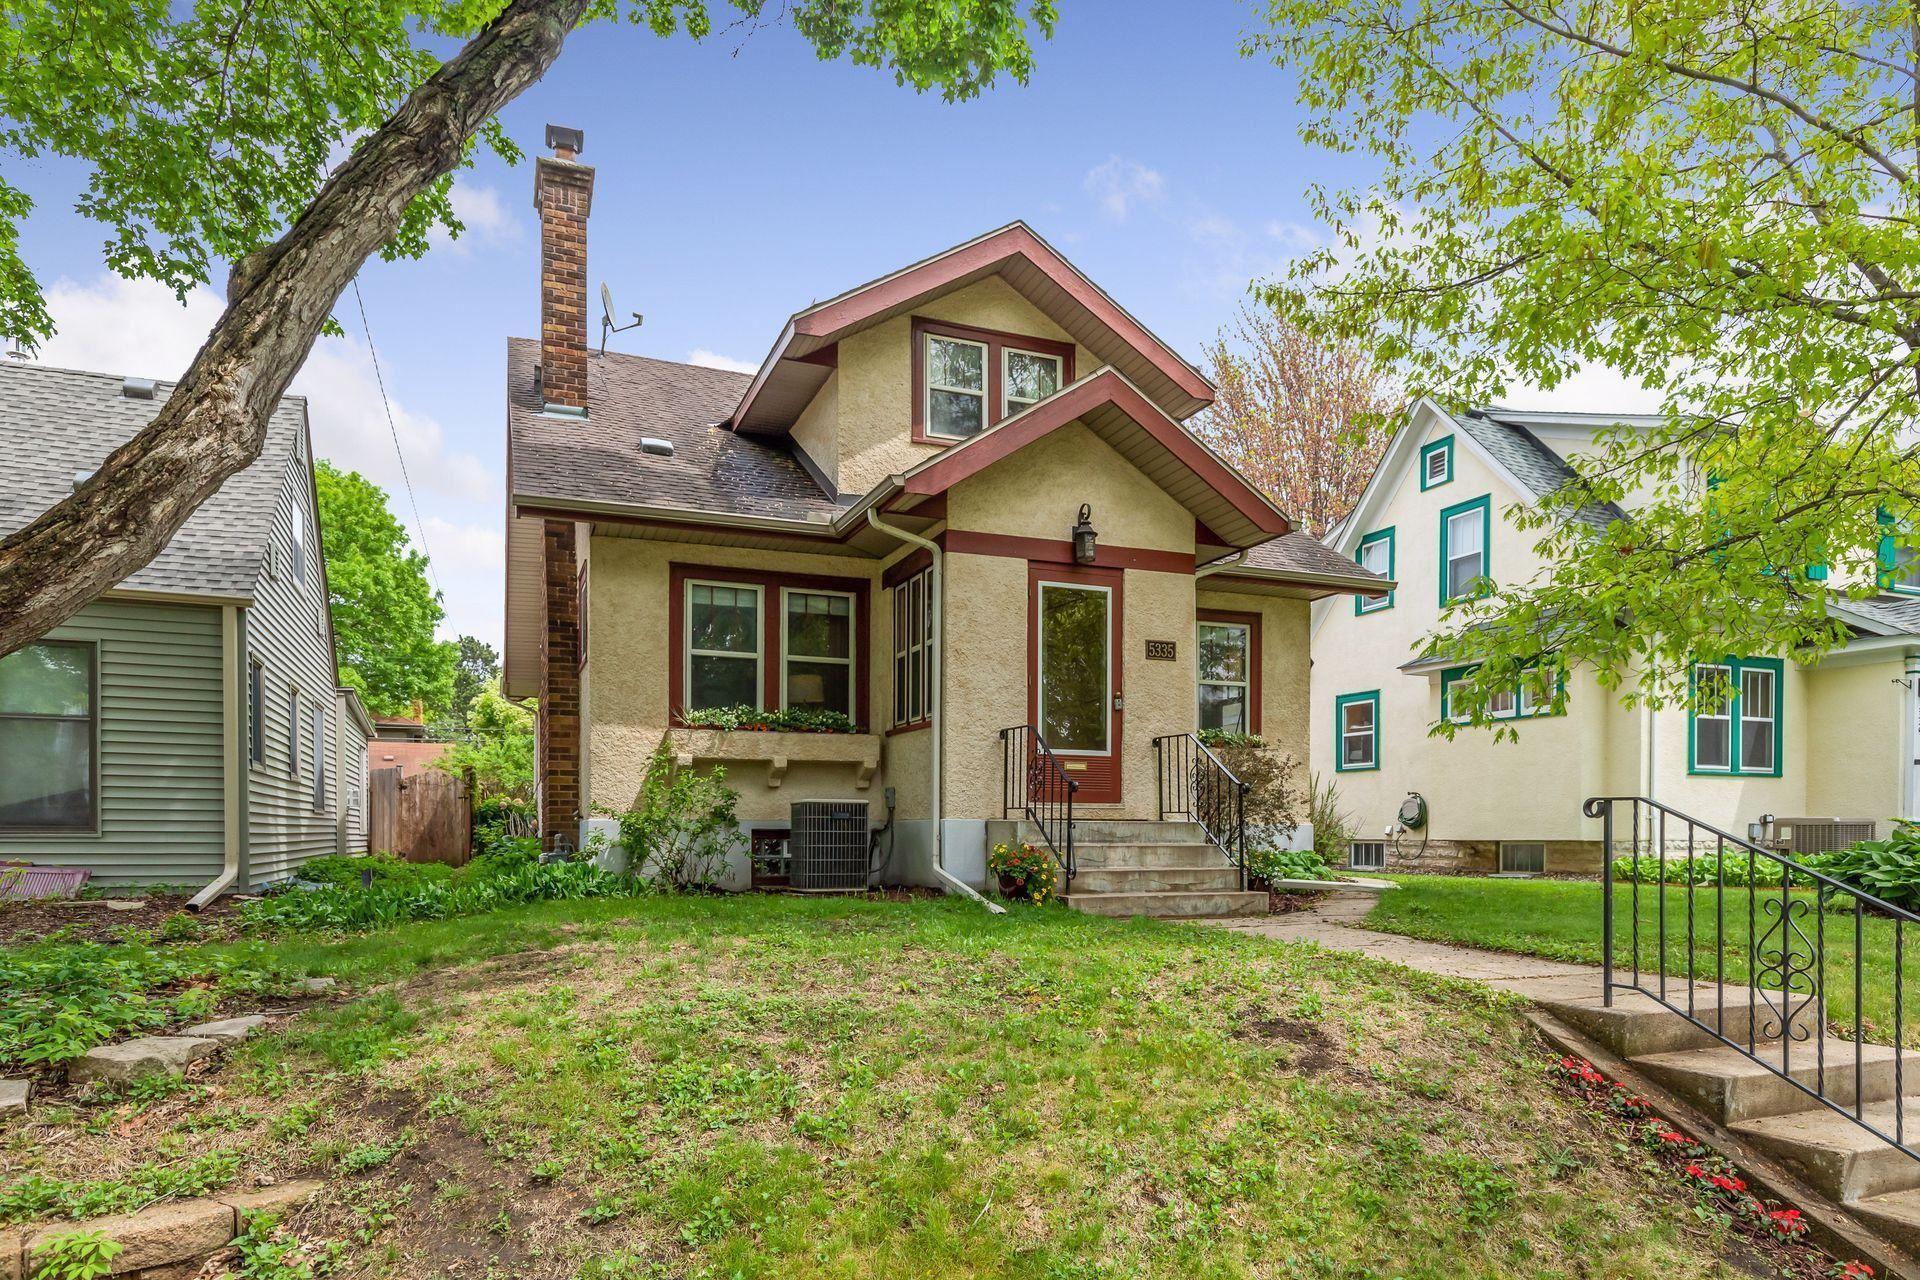 Photo of 5335 Emerson Avenue S, Minneapolis, MN 55419 (MLS # 5720917)